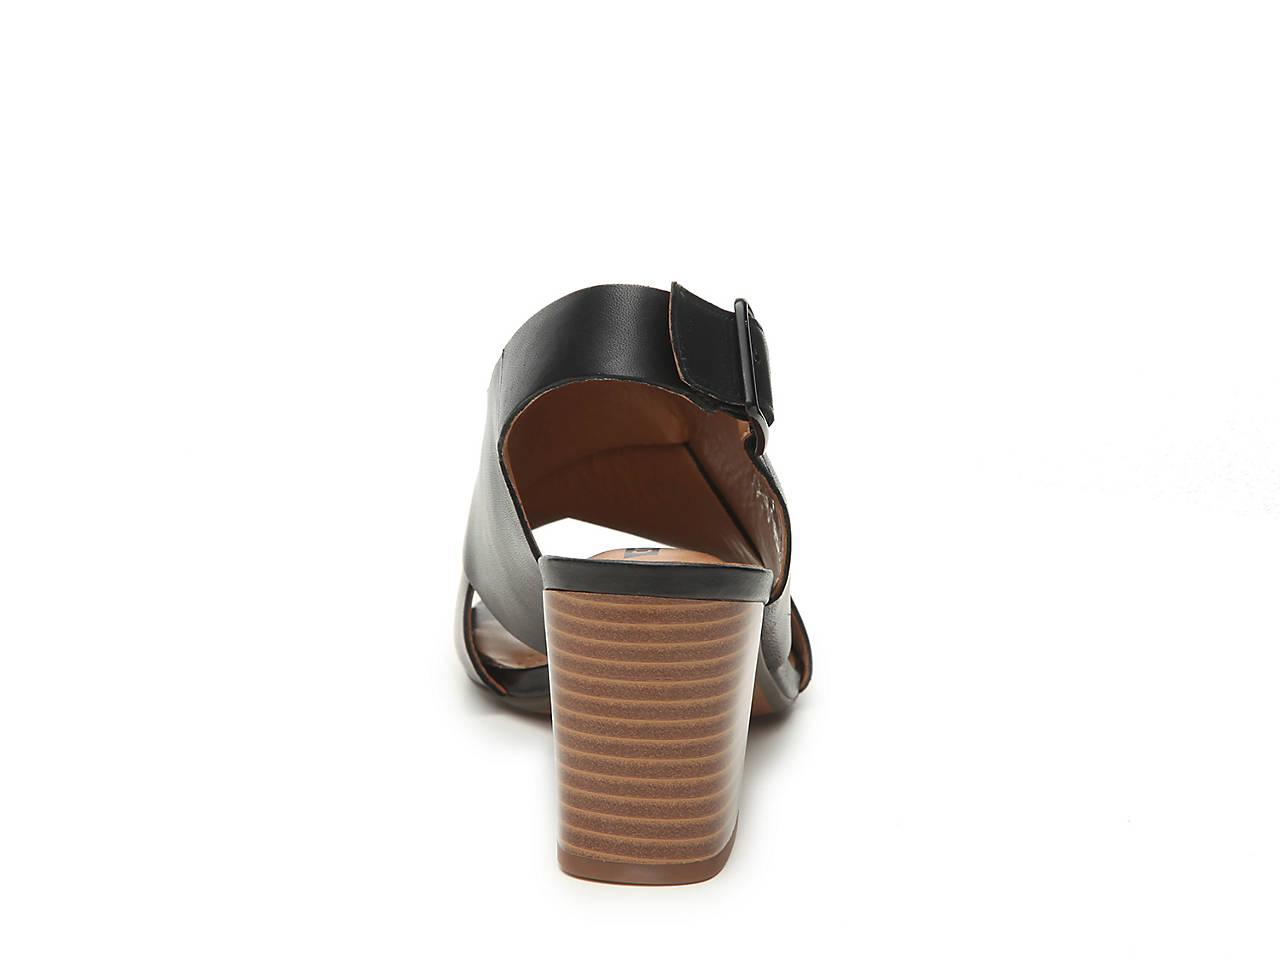 559e1b90551 Clarks Deva Janie Sandal Women s Shoes